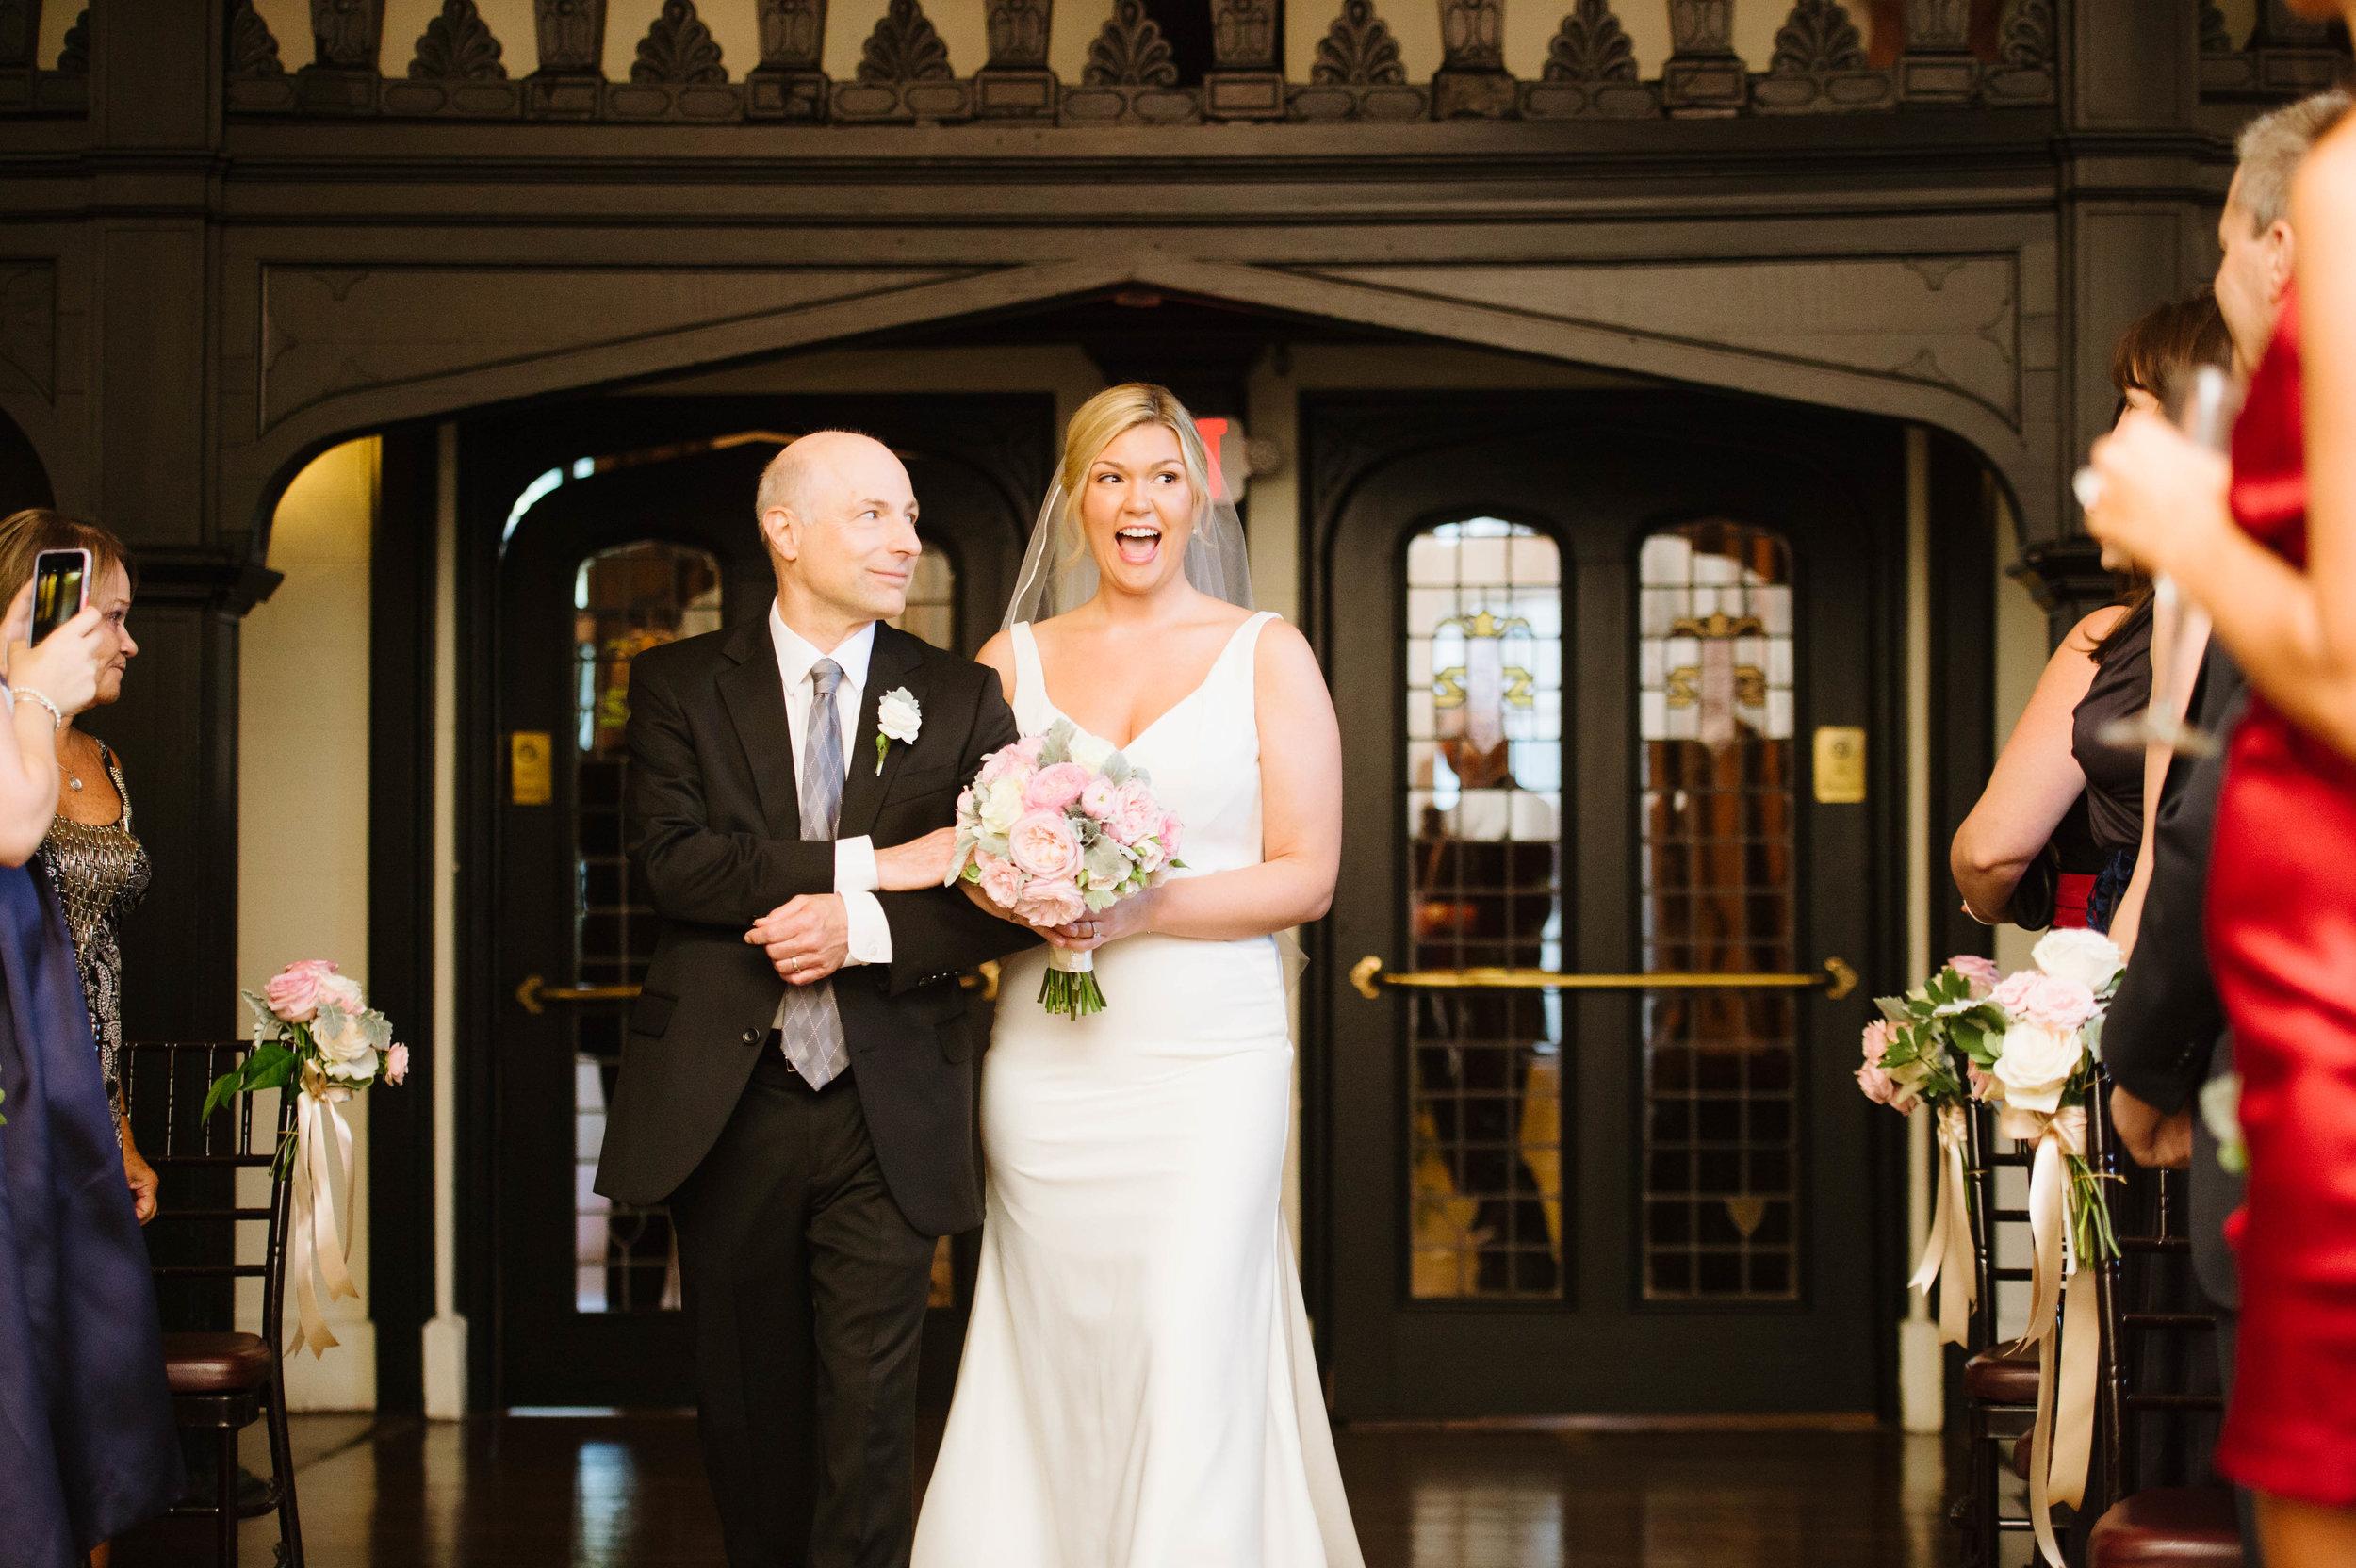 Alden_Castle_Wedding_Boston020.jpg